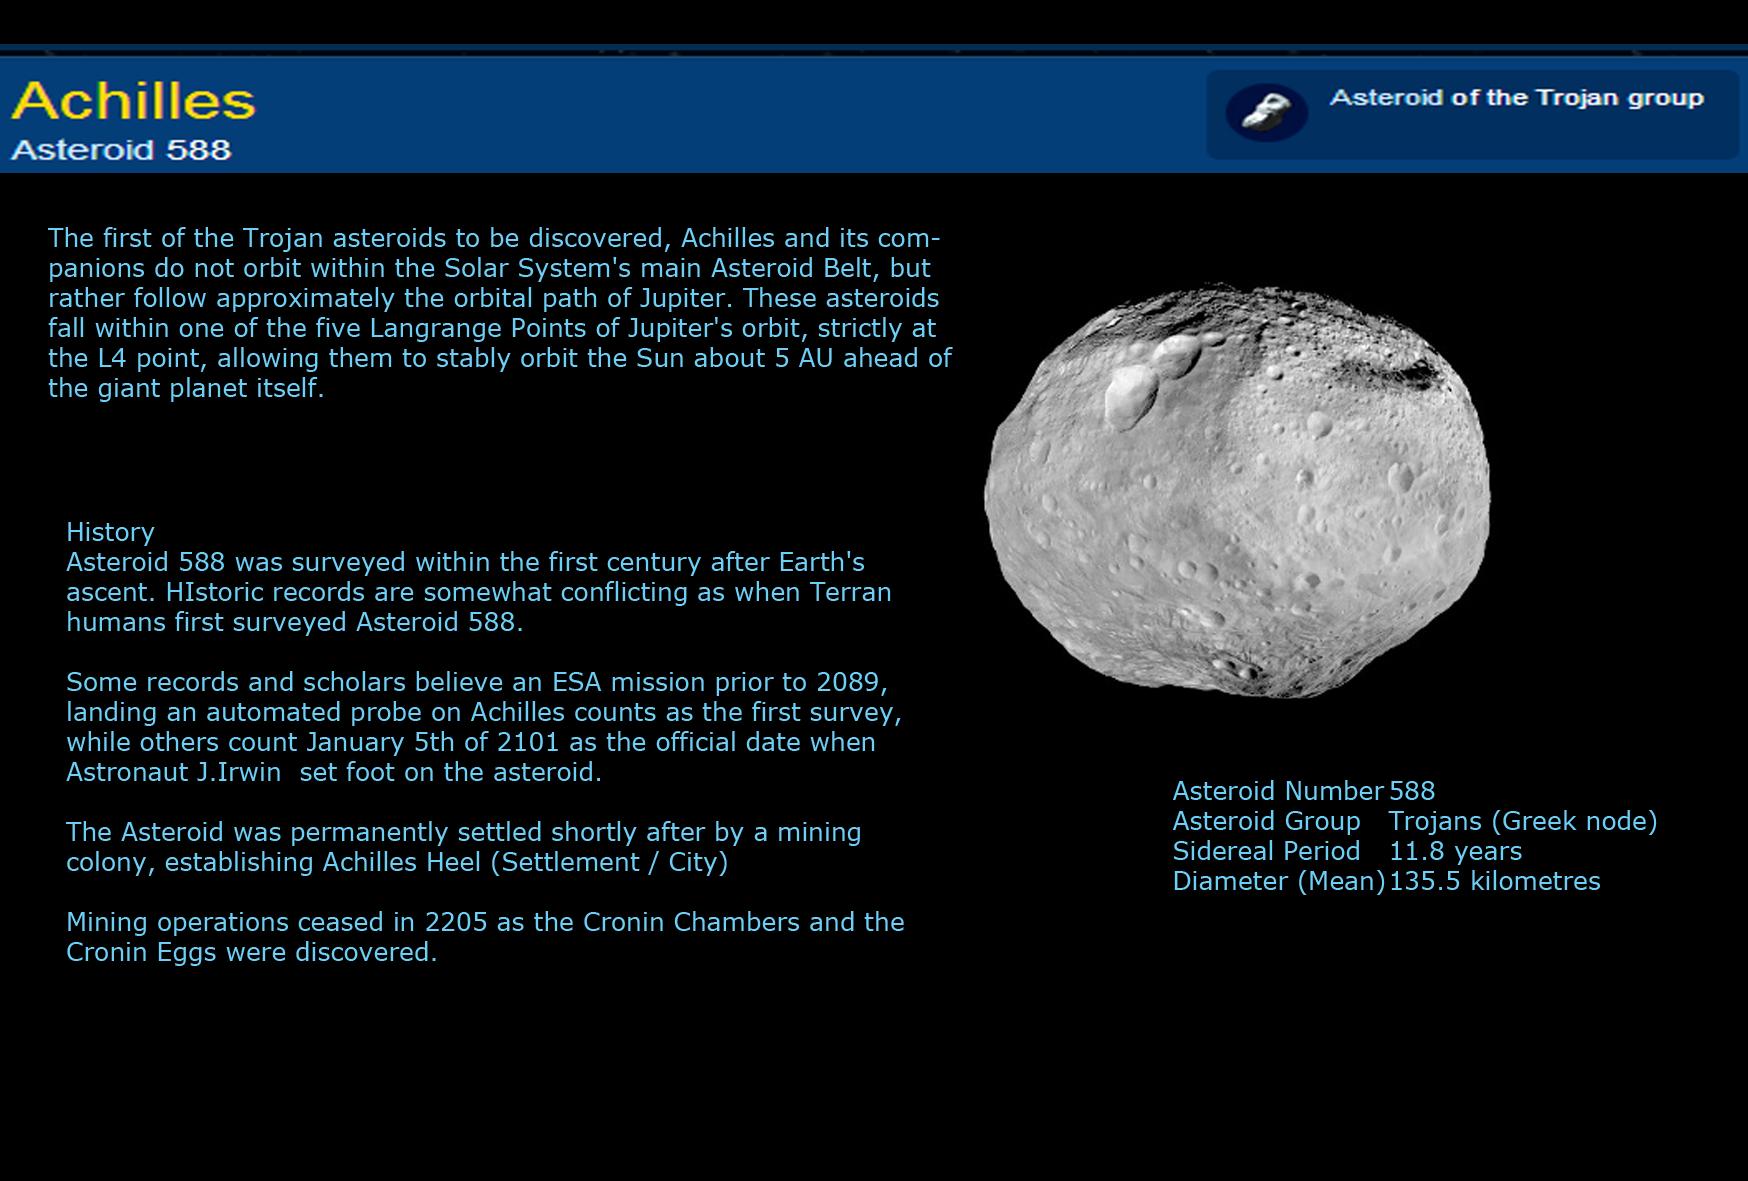 Asteroid 588